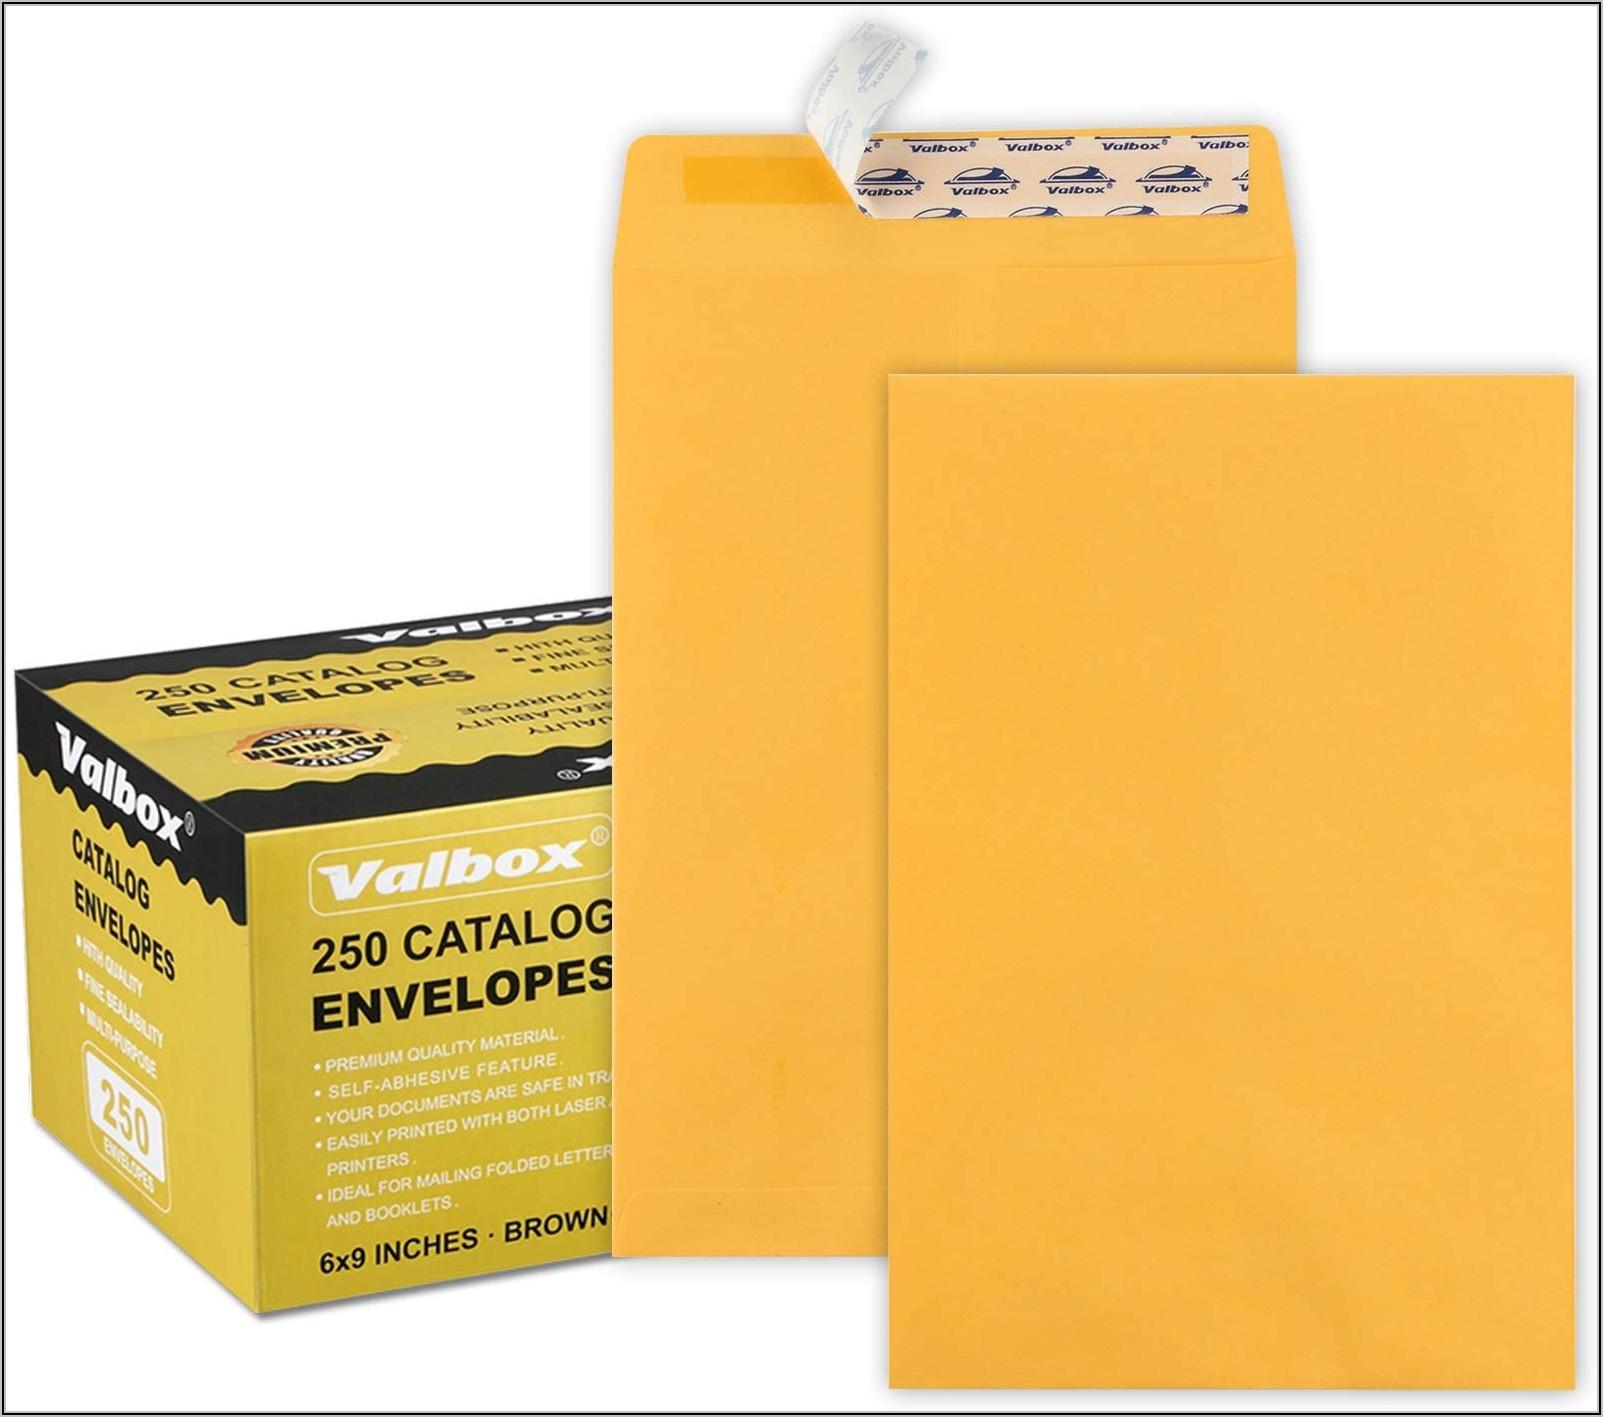 6 X 9 Booklet Window Envelopes